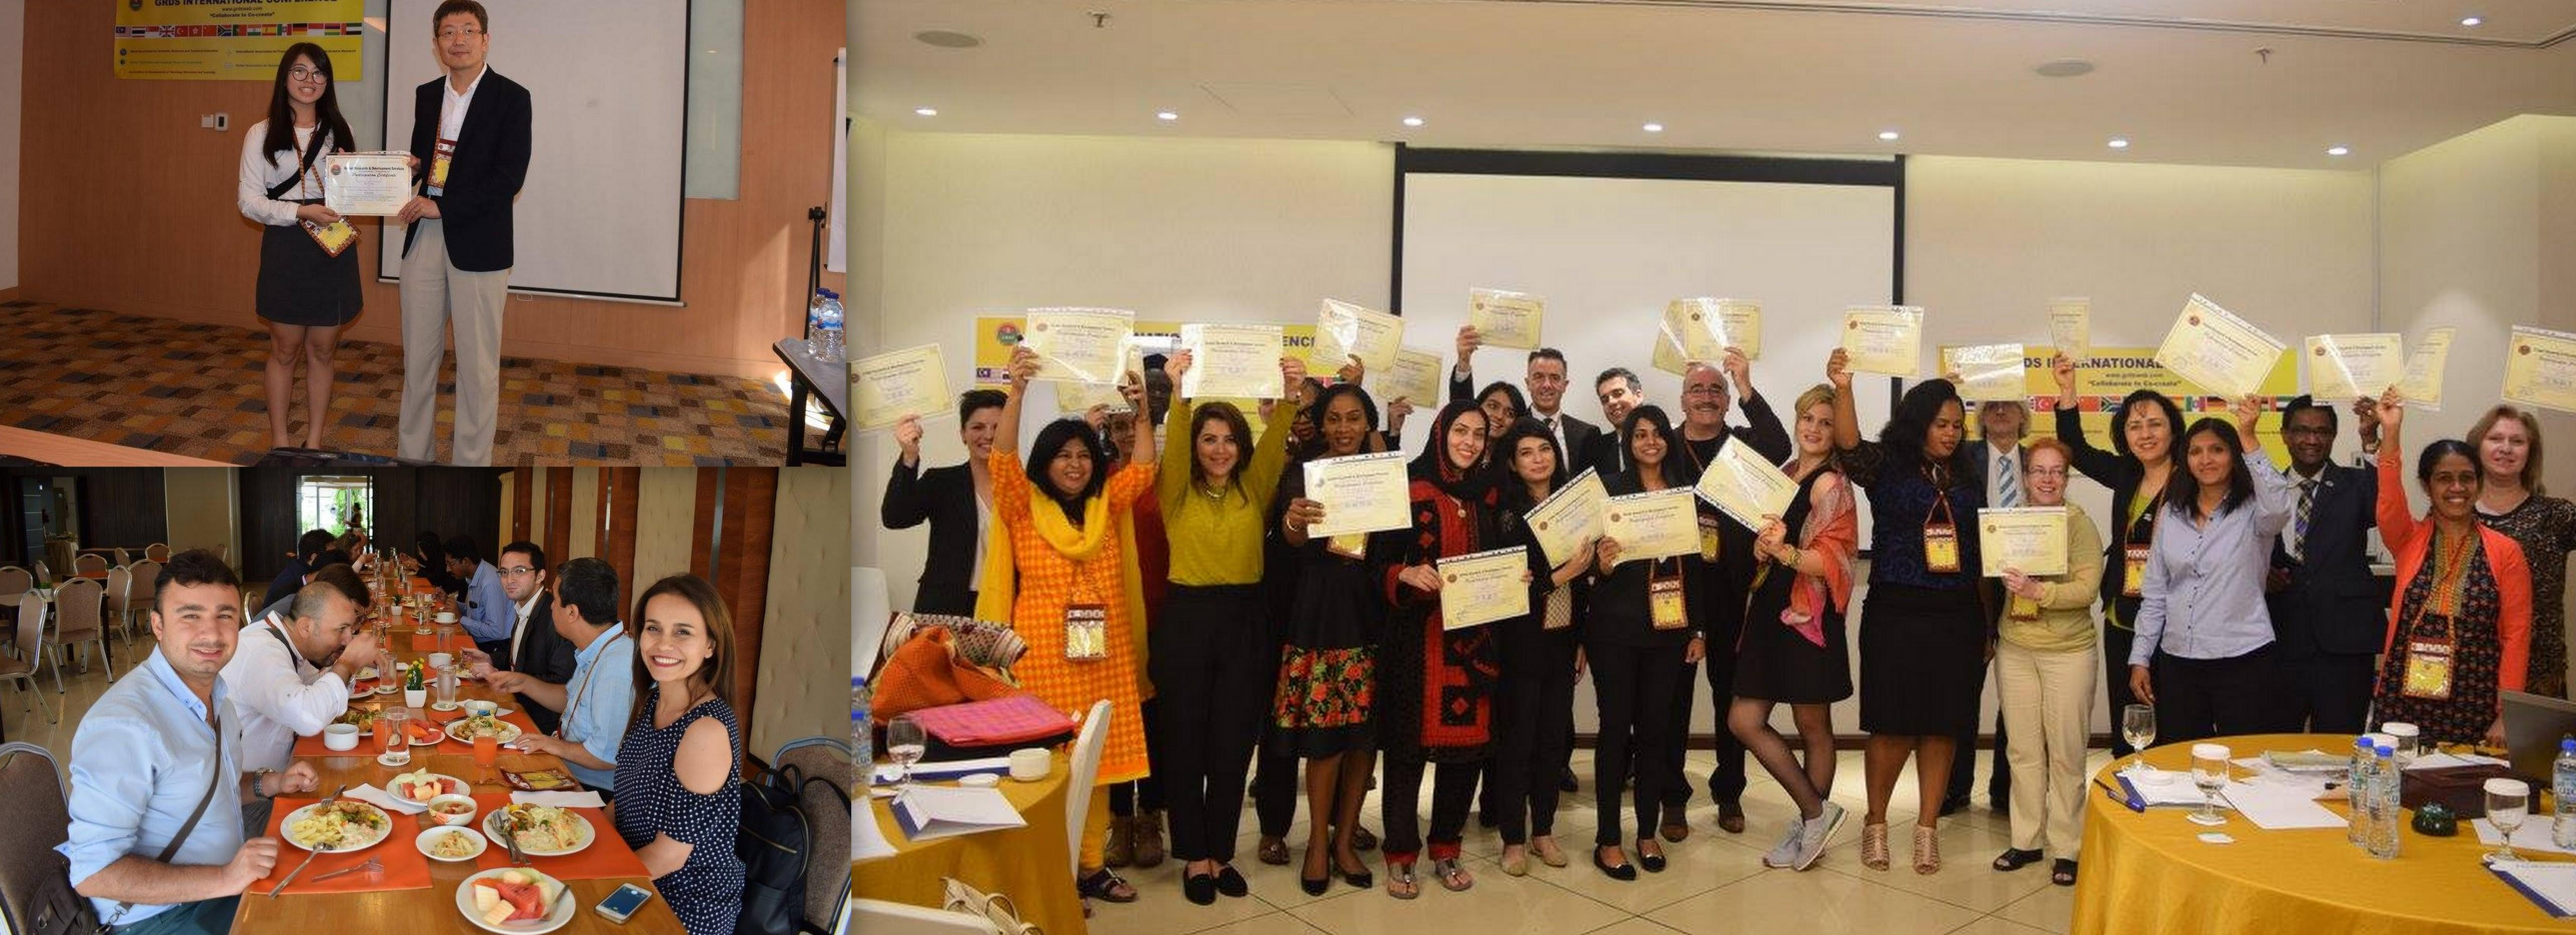 ICSTR Athens – International Conference on Sc